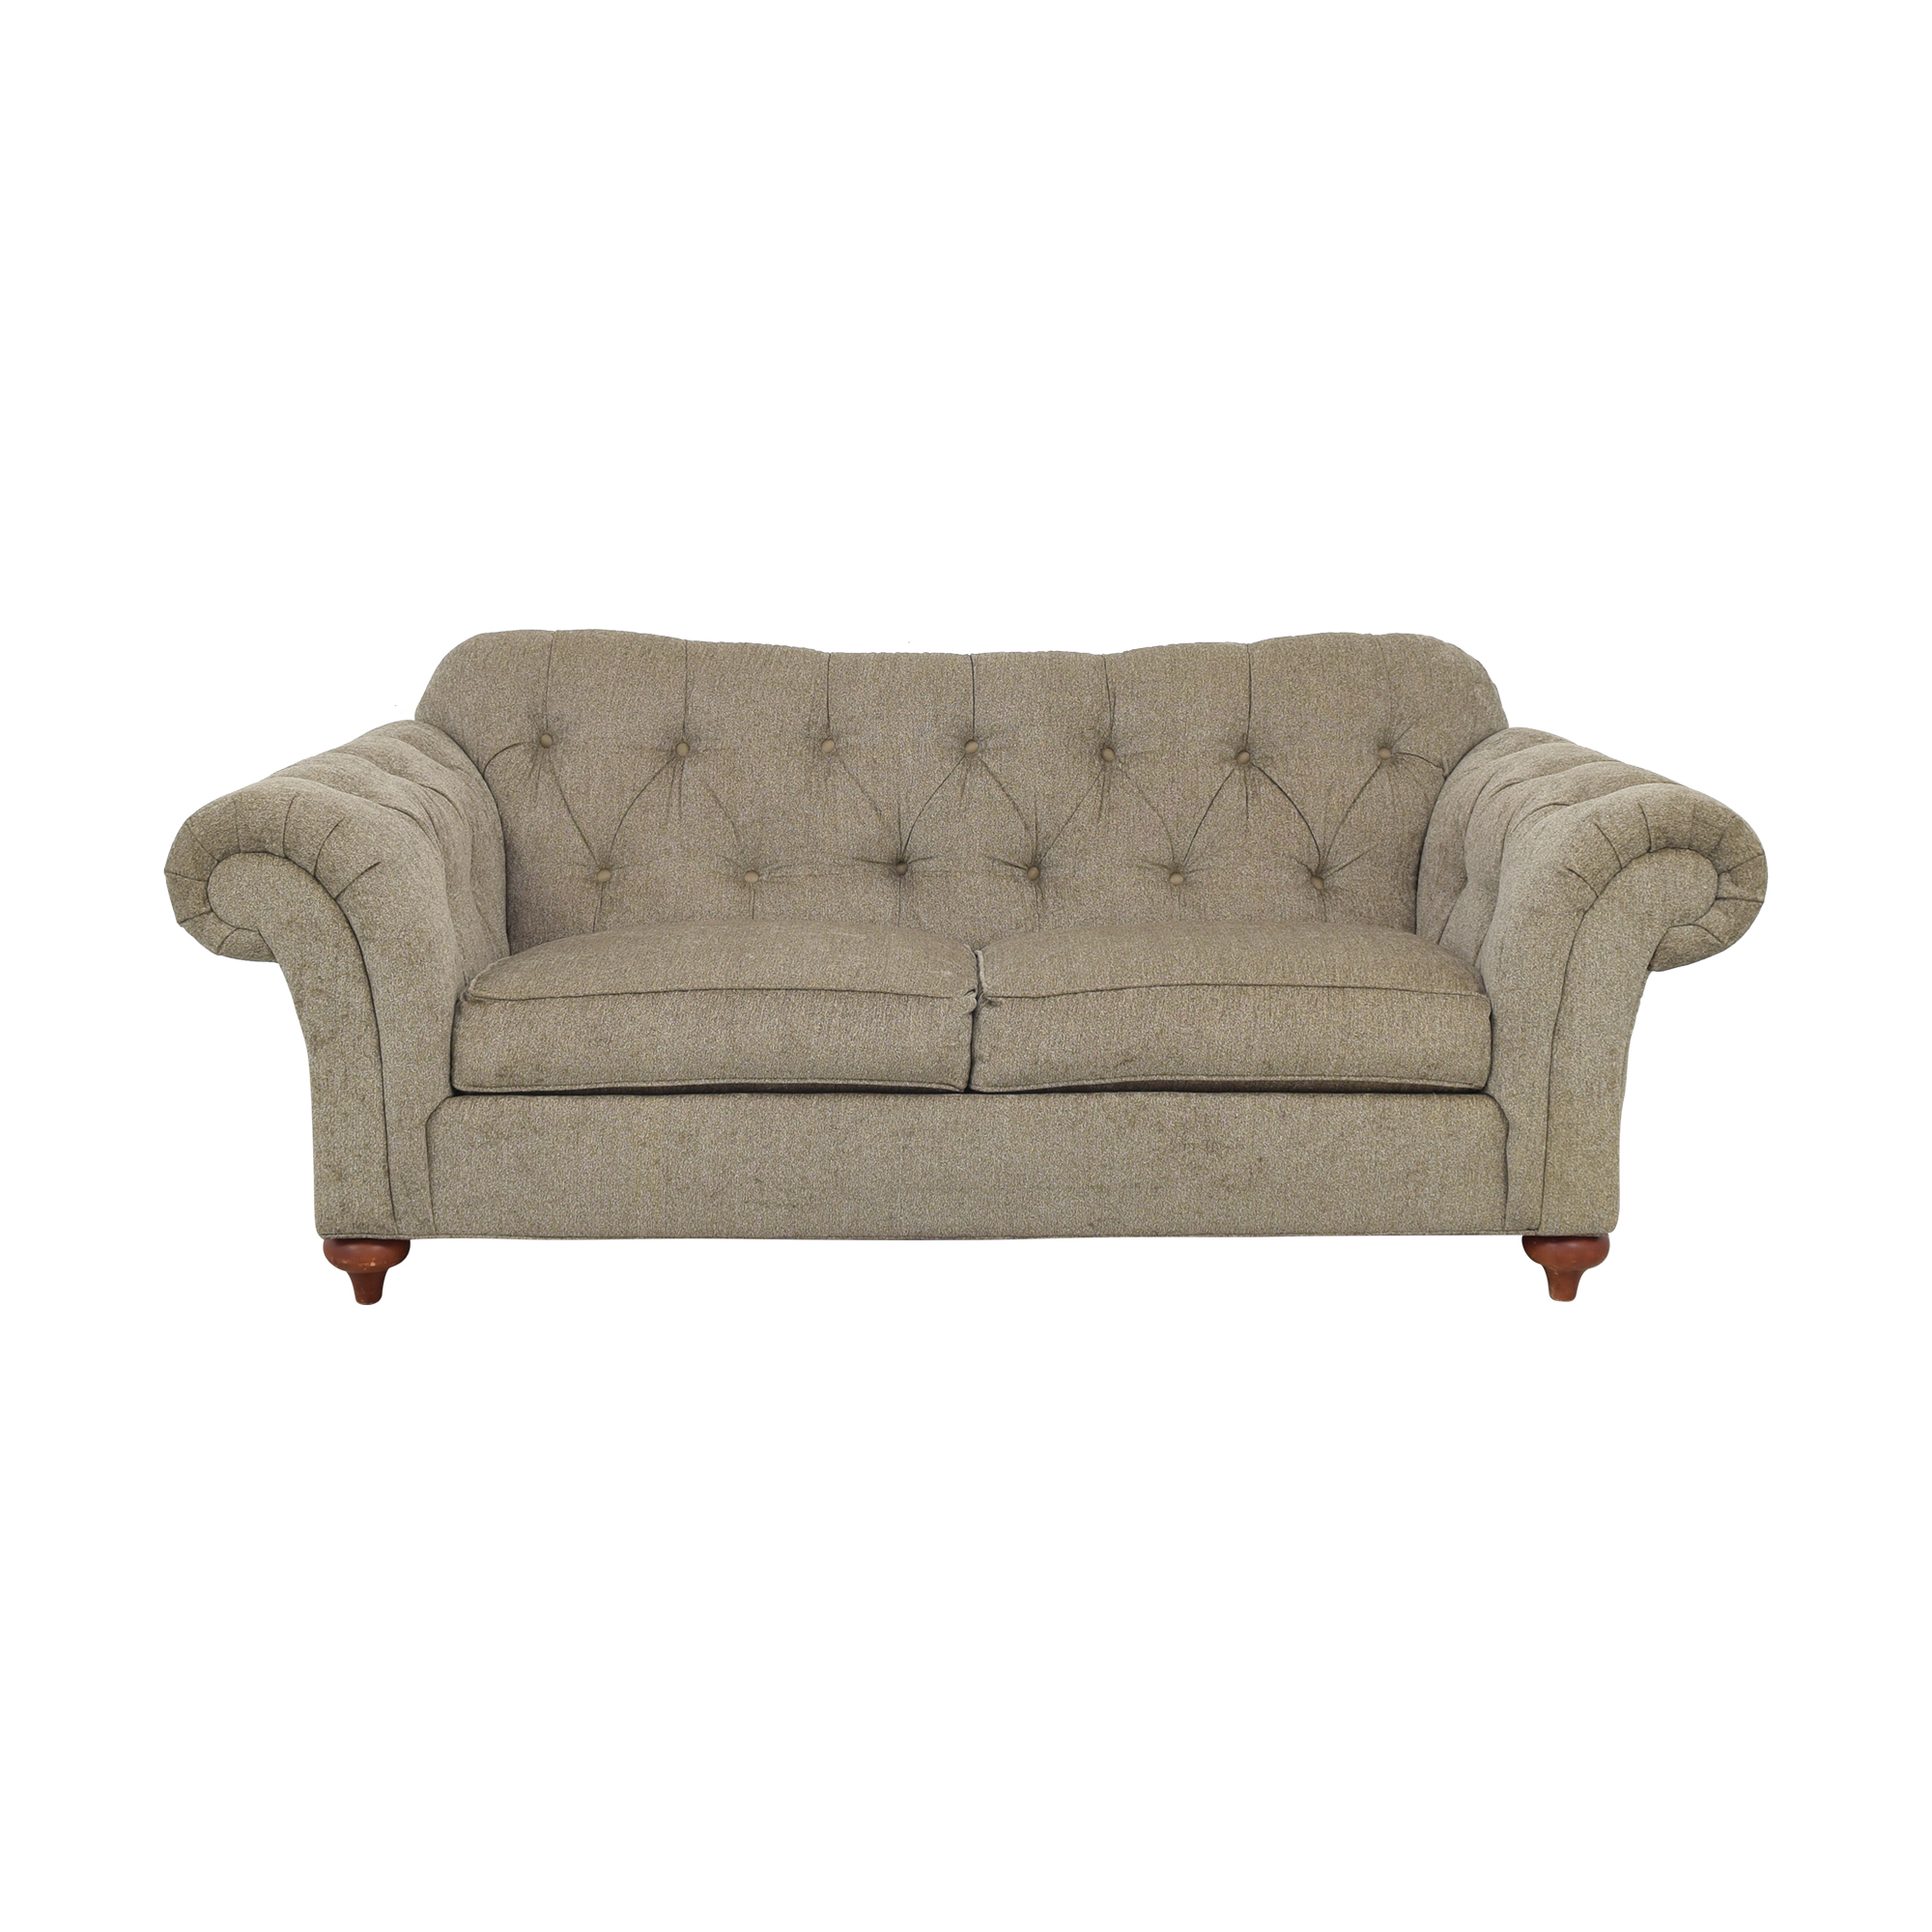 Ethan Allen Ethan Allen Two Cushion Sofa Classic Sofas